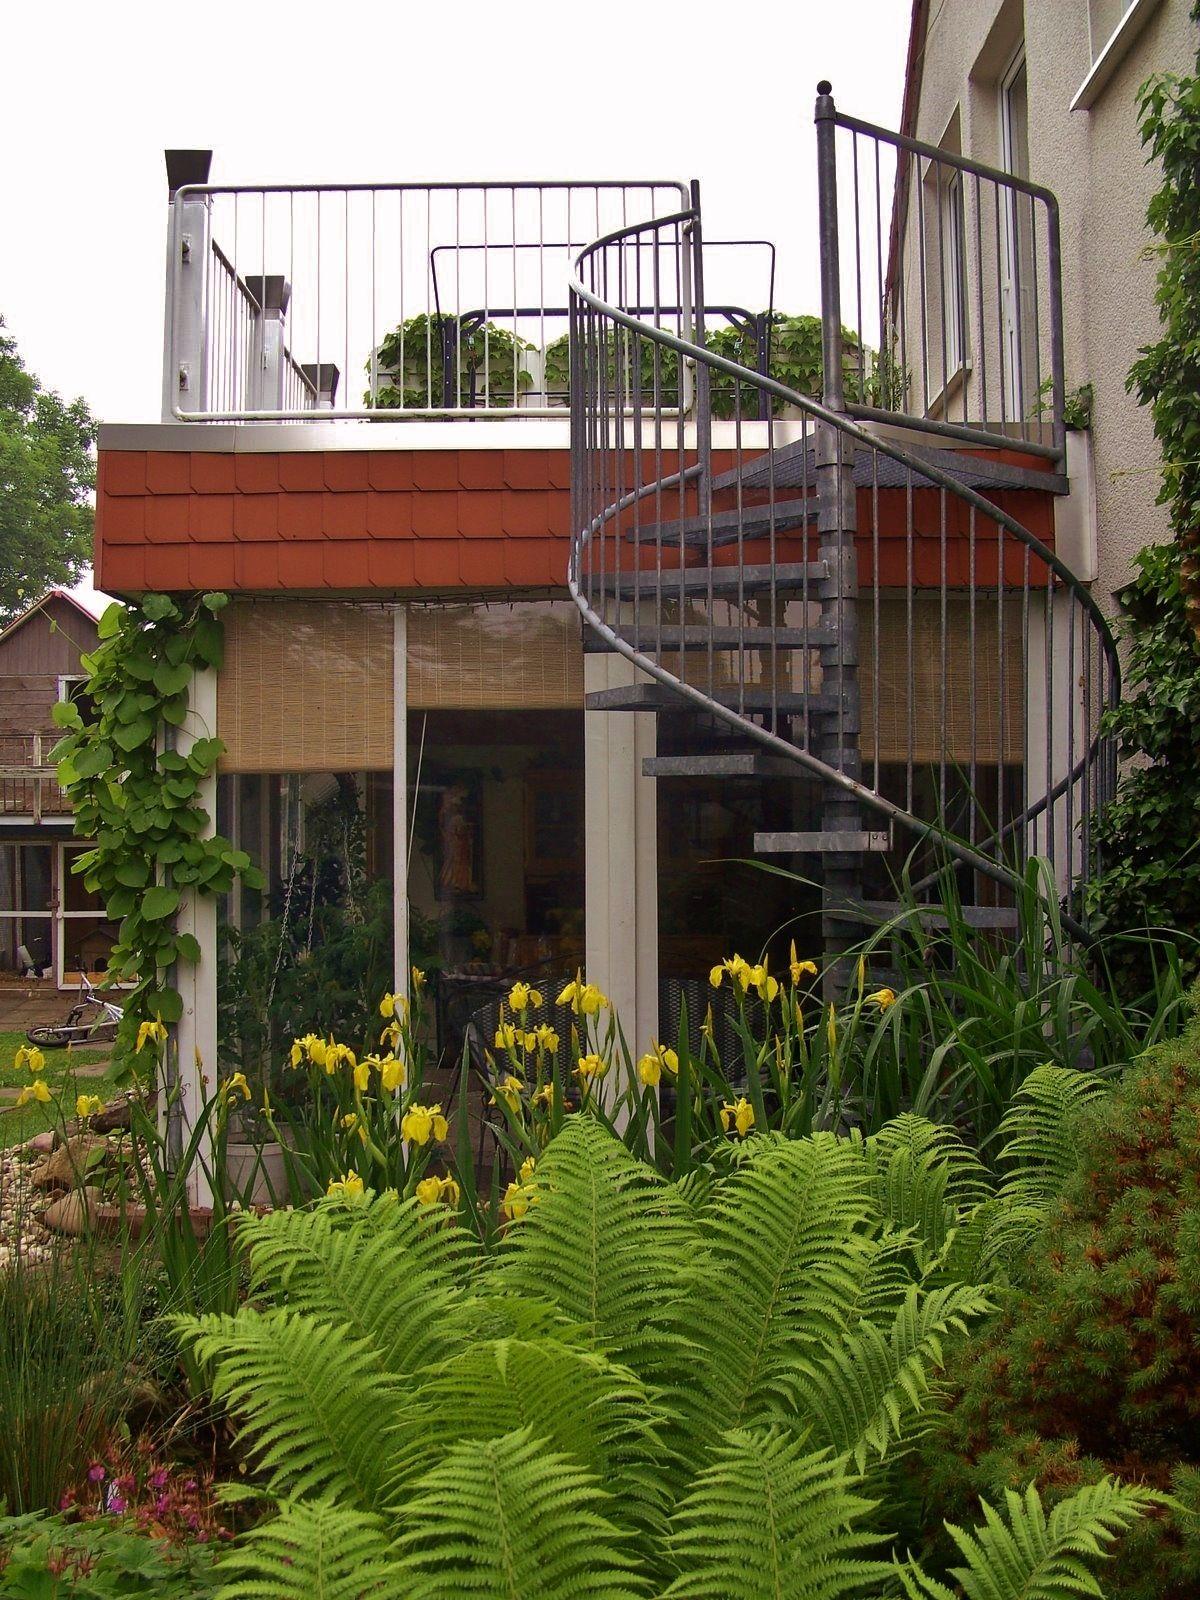 Wintergarten / Balkon / Wendeltreppe | Outdoors | Pinterest